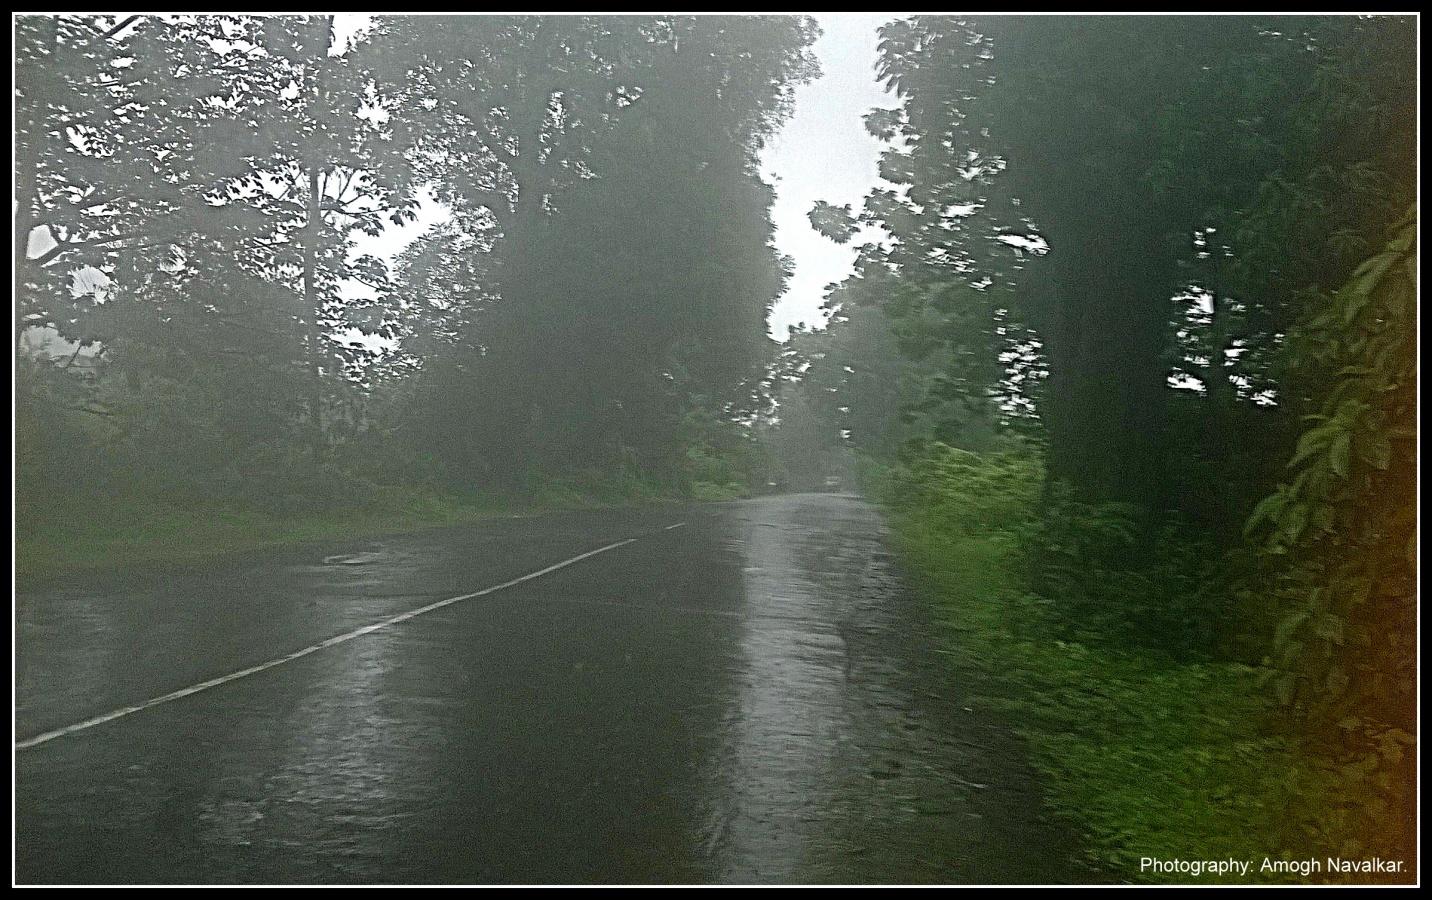 Glimpse Of Konkan In Rainy Season India Travel Forum